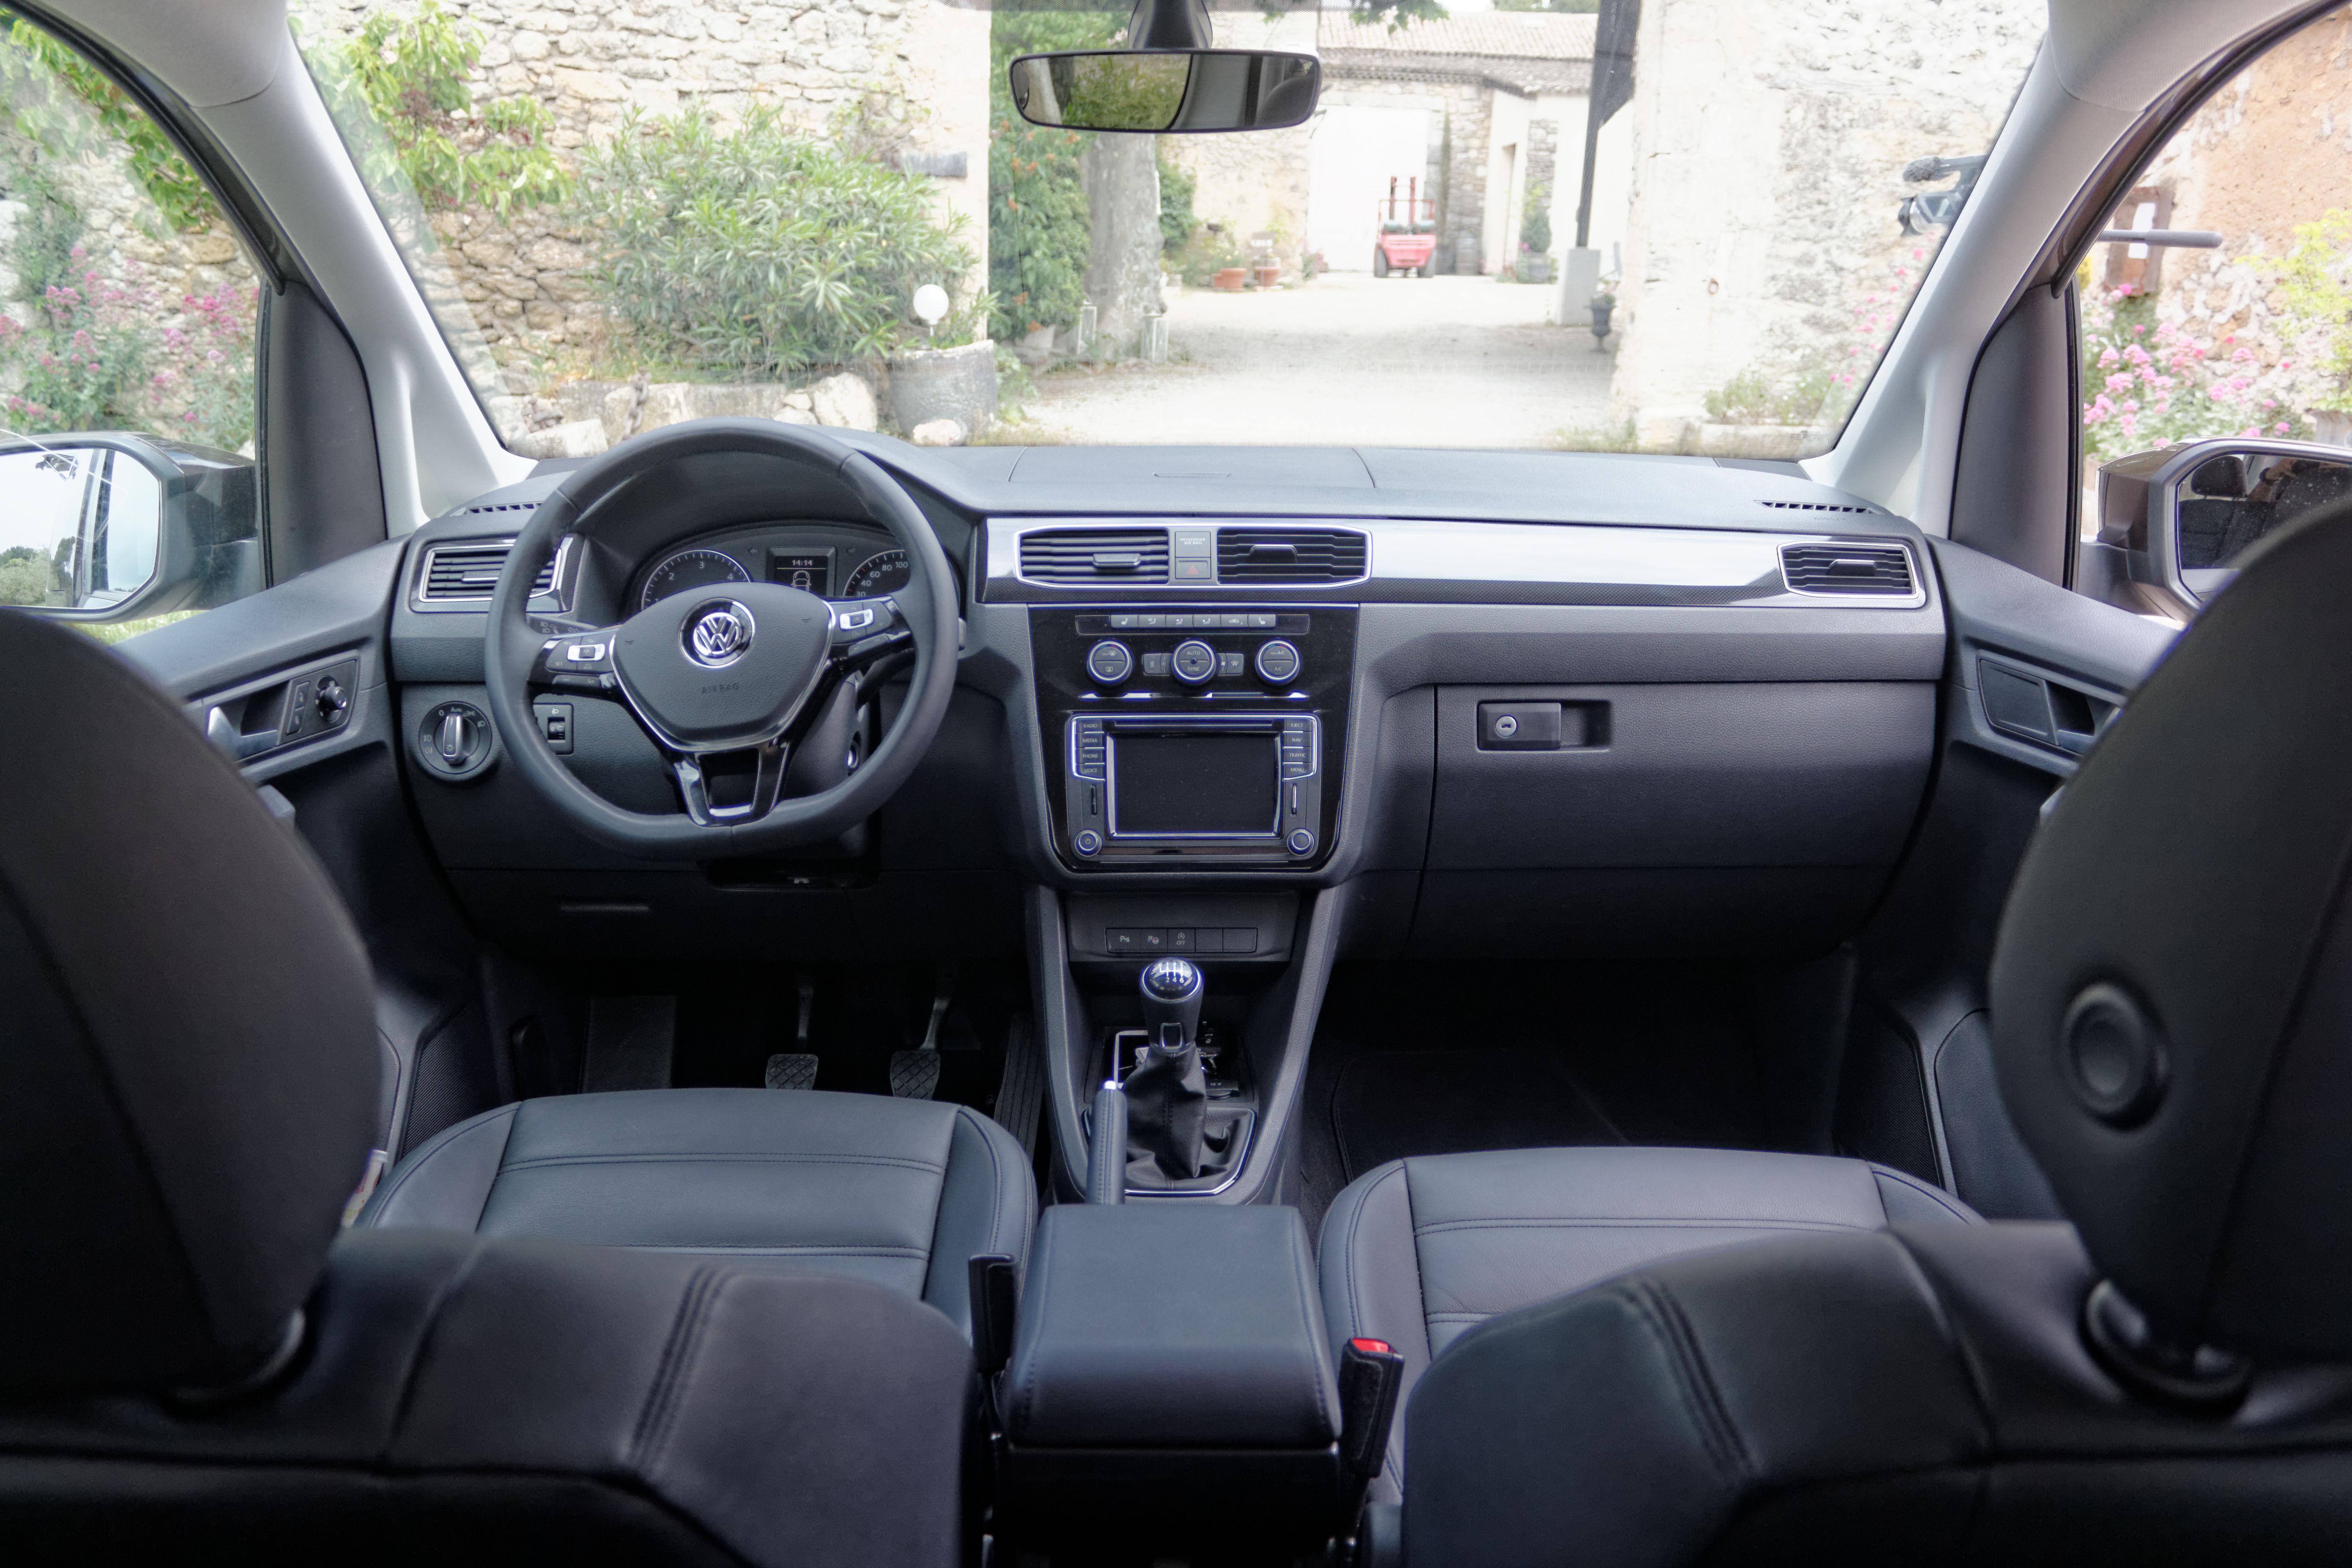 Essai vid o volkswagen caddy ludospace high tech for Interieur francais